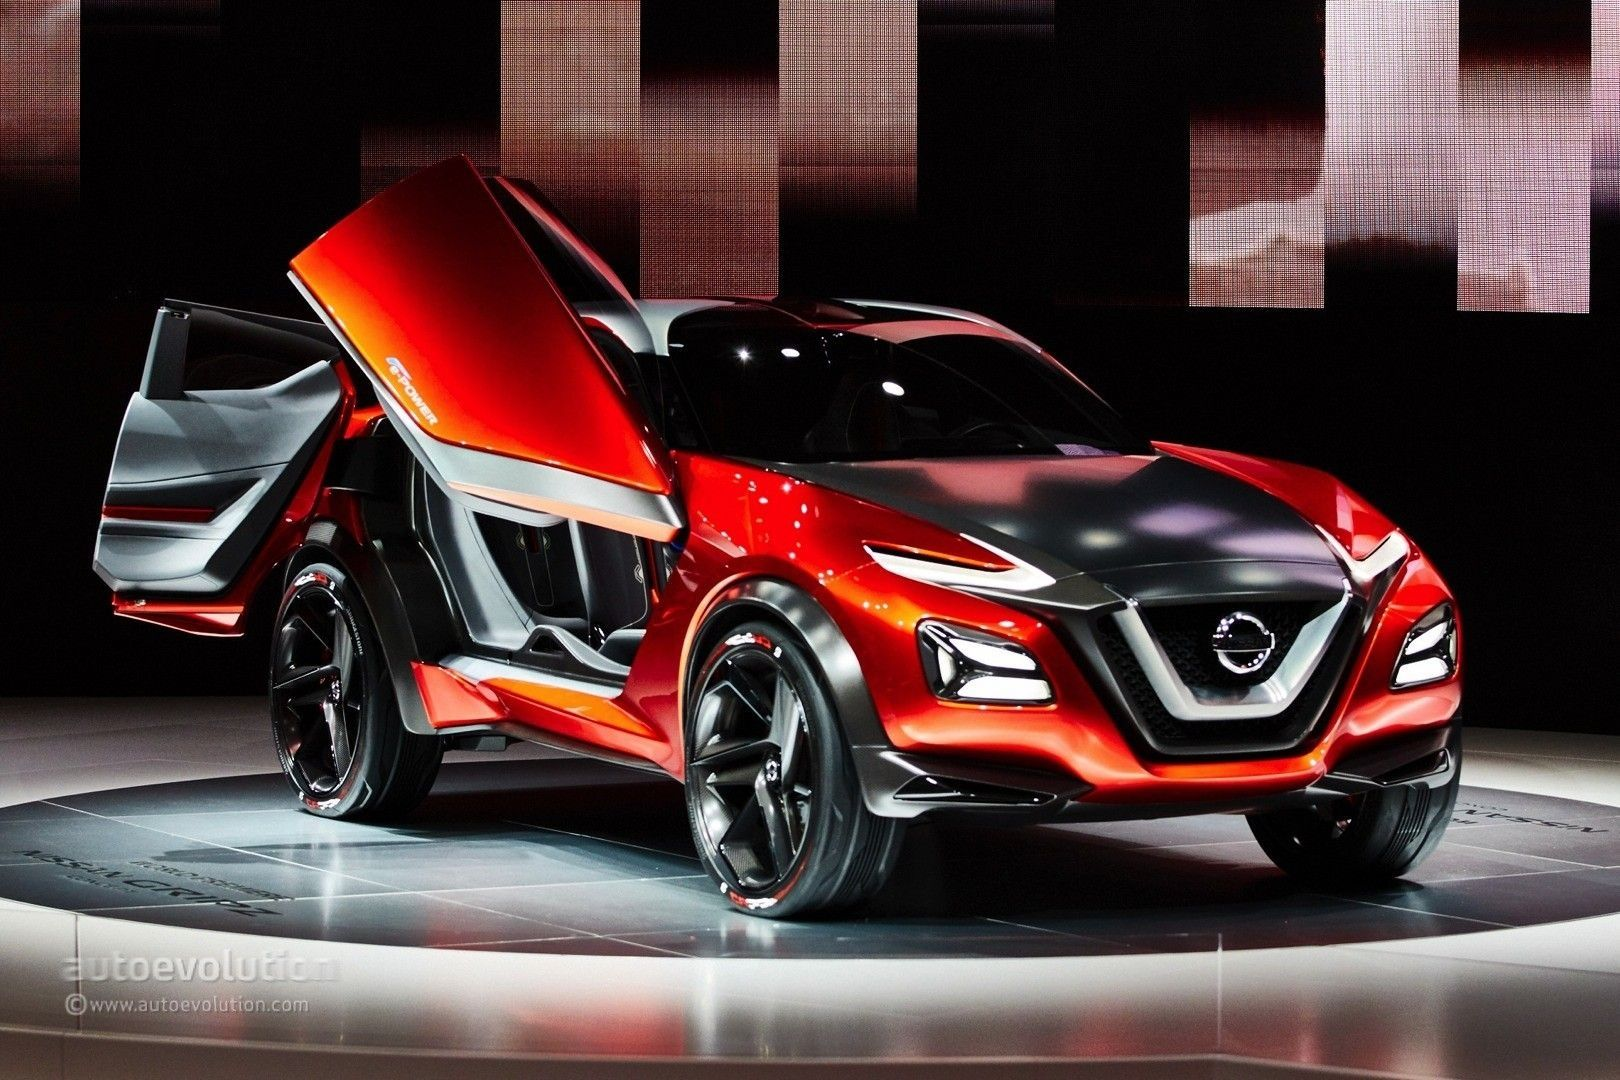 New Nissan Juke 2020 Spy Shoot Car Wallpaper Nissan